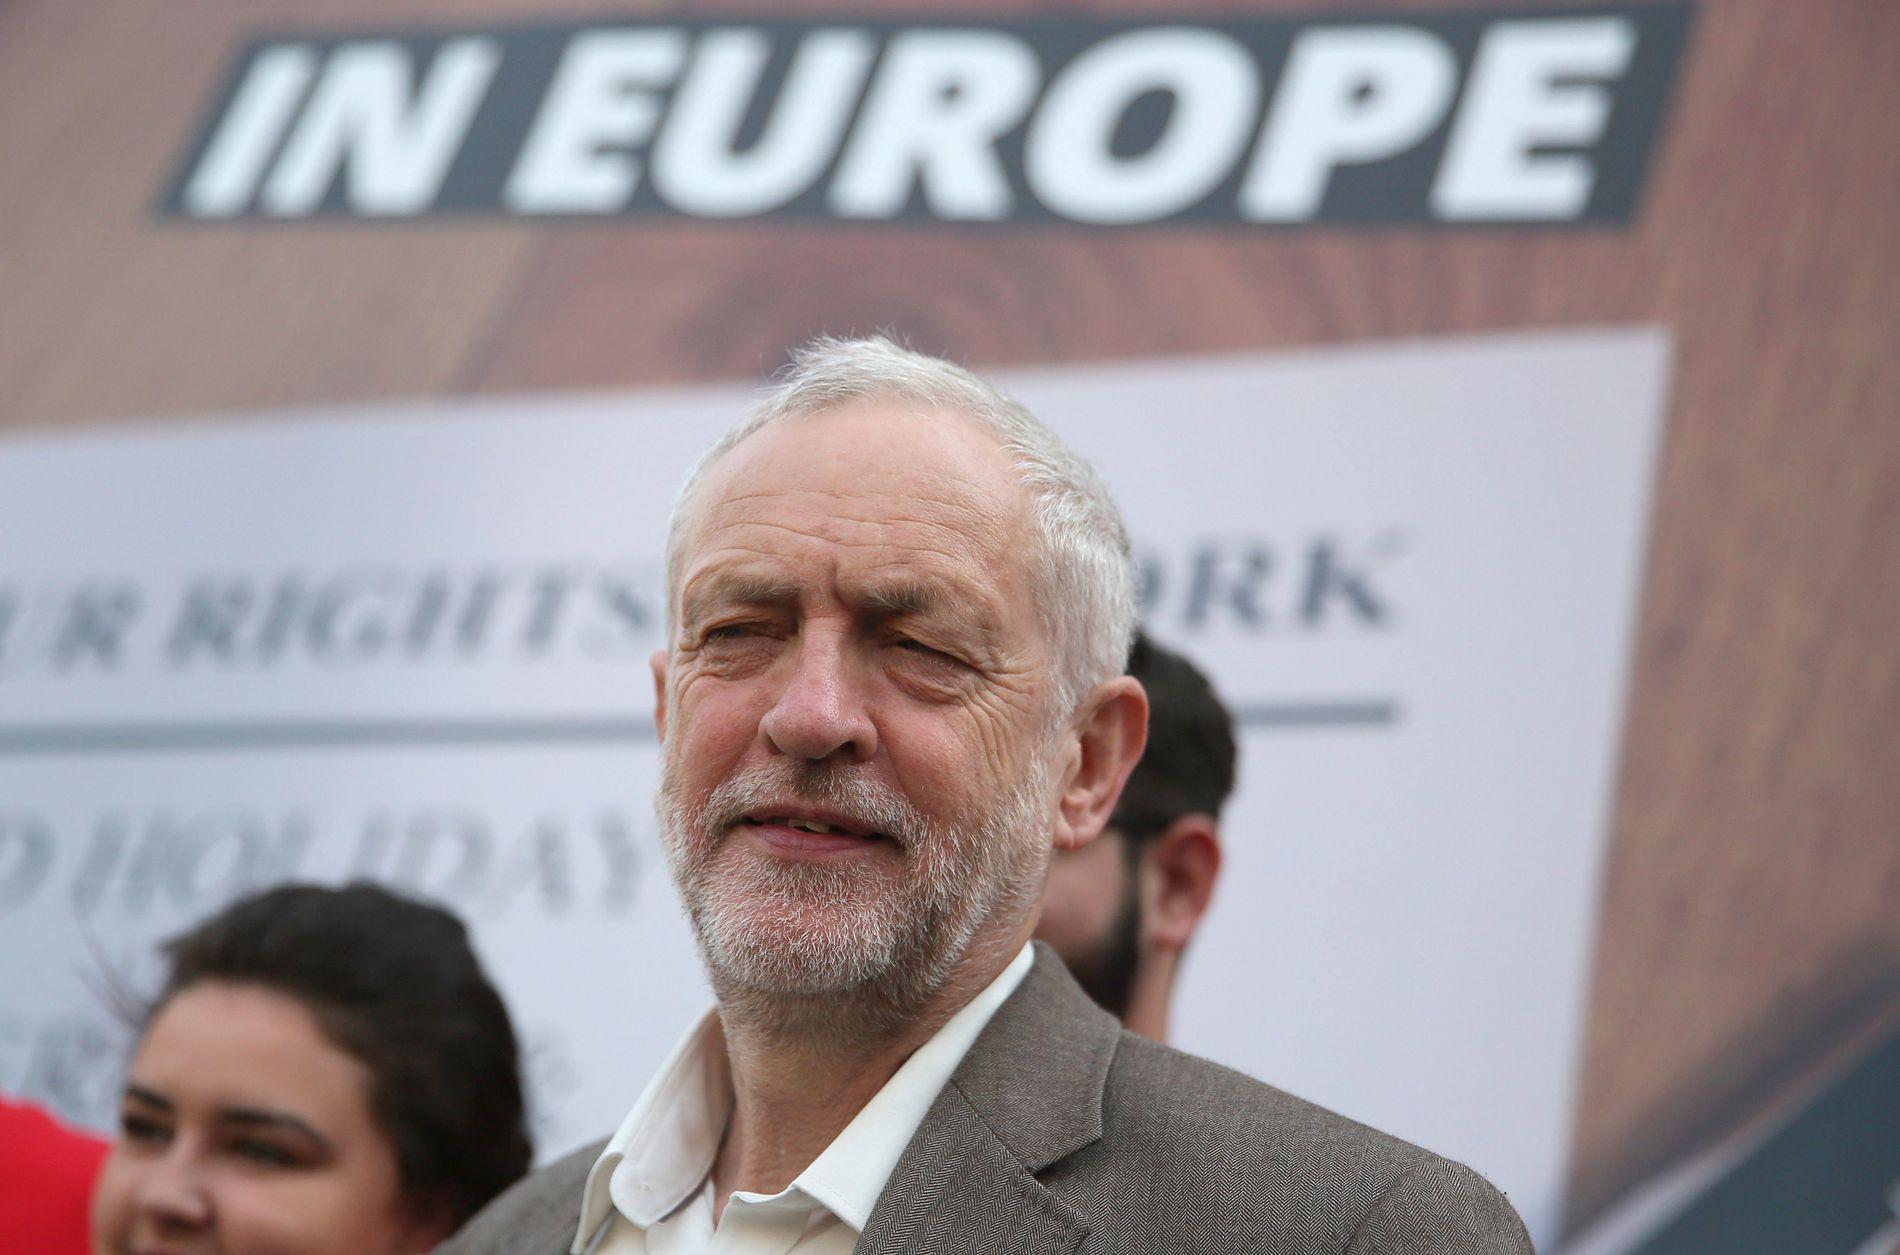 HALVHJERTET: Labour-leder Jeremy Corbyn snakker under et valgkamparrangement i London 6.juni.